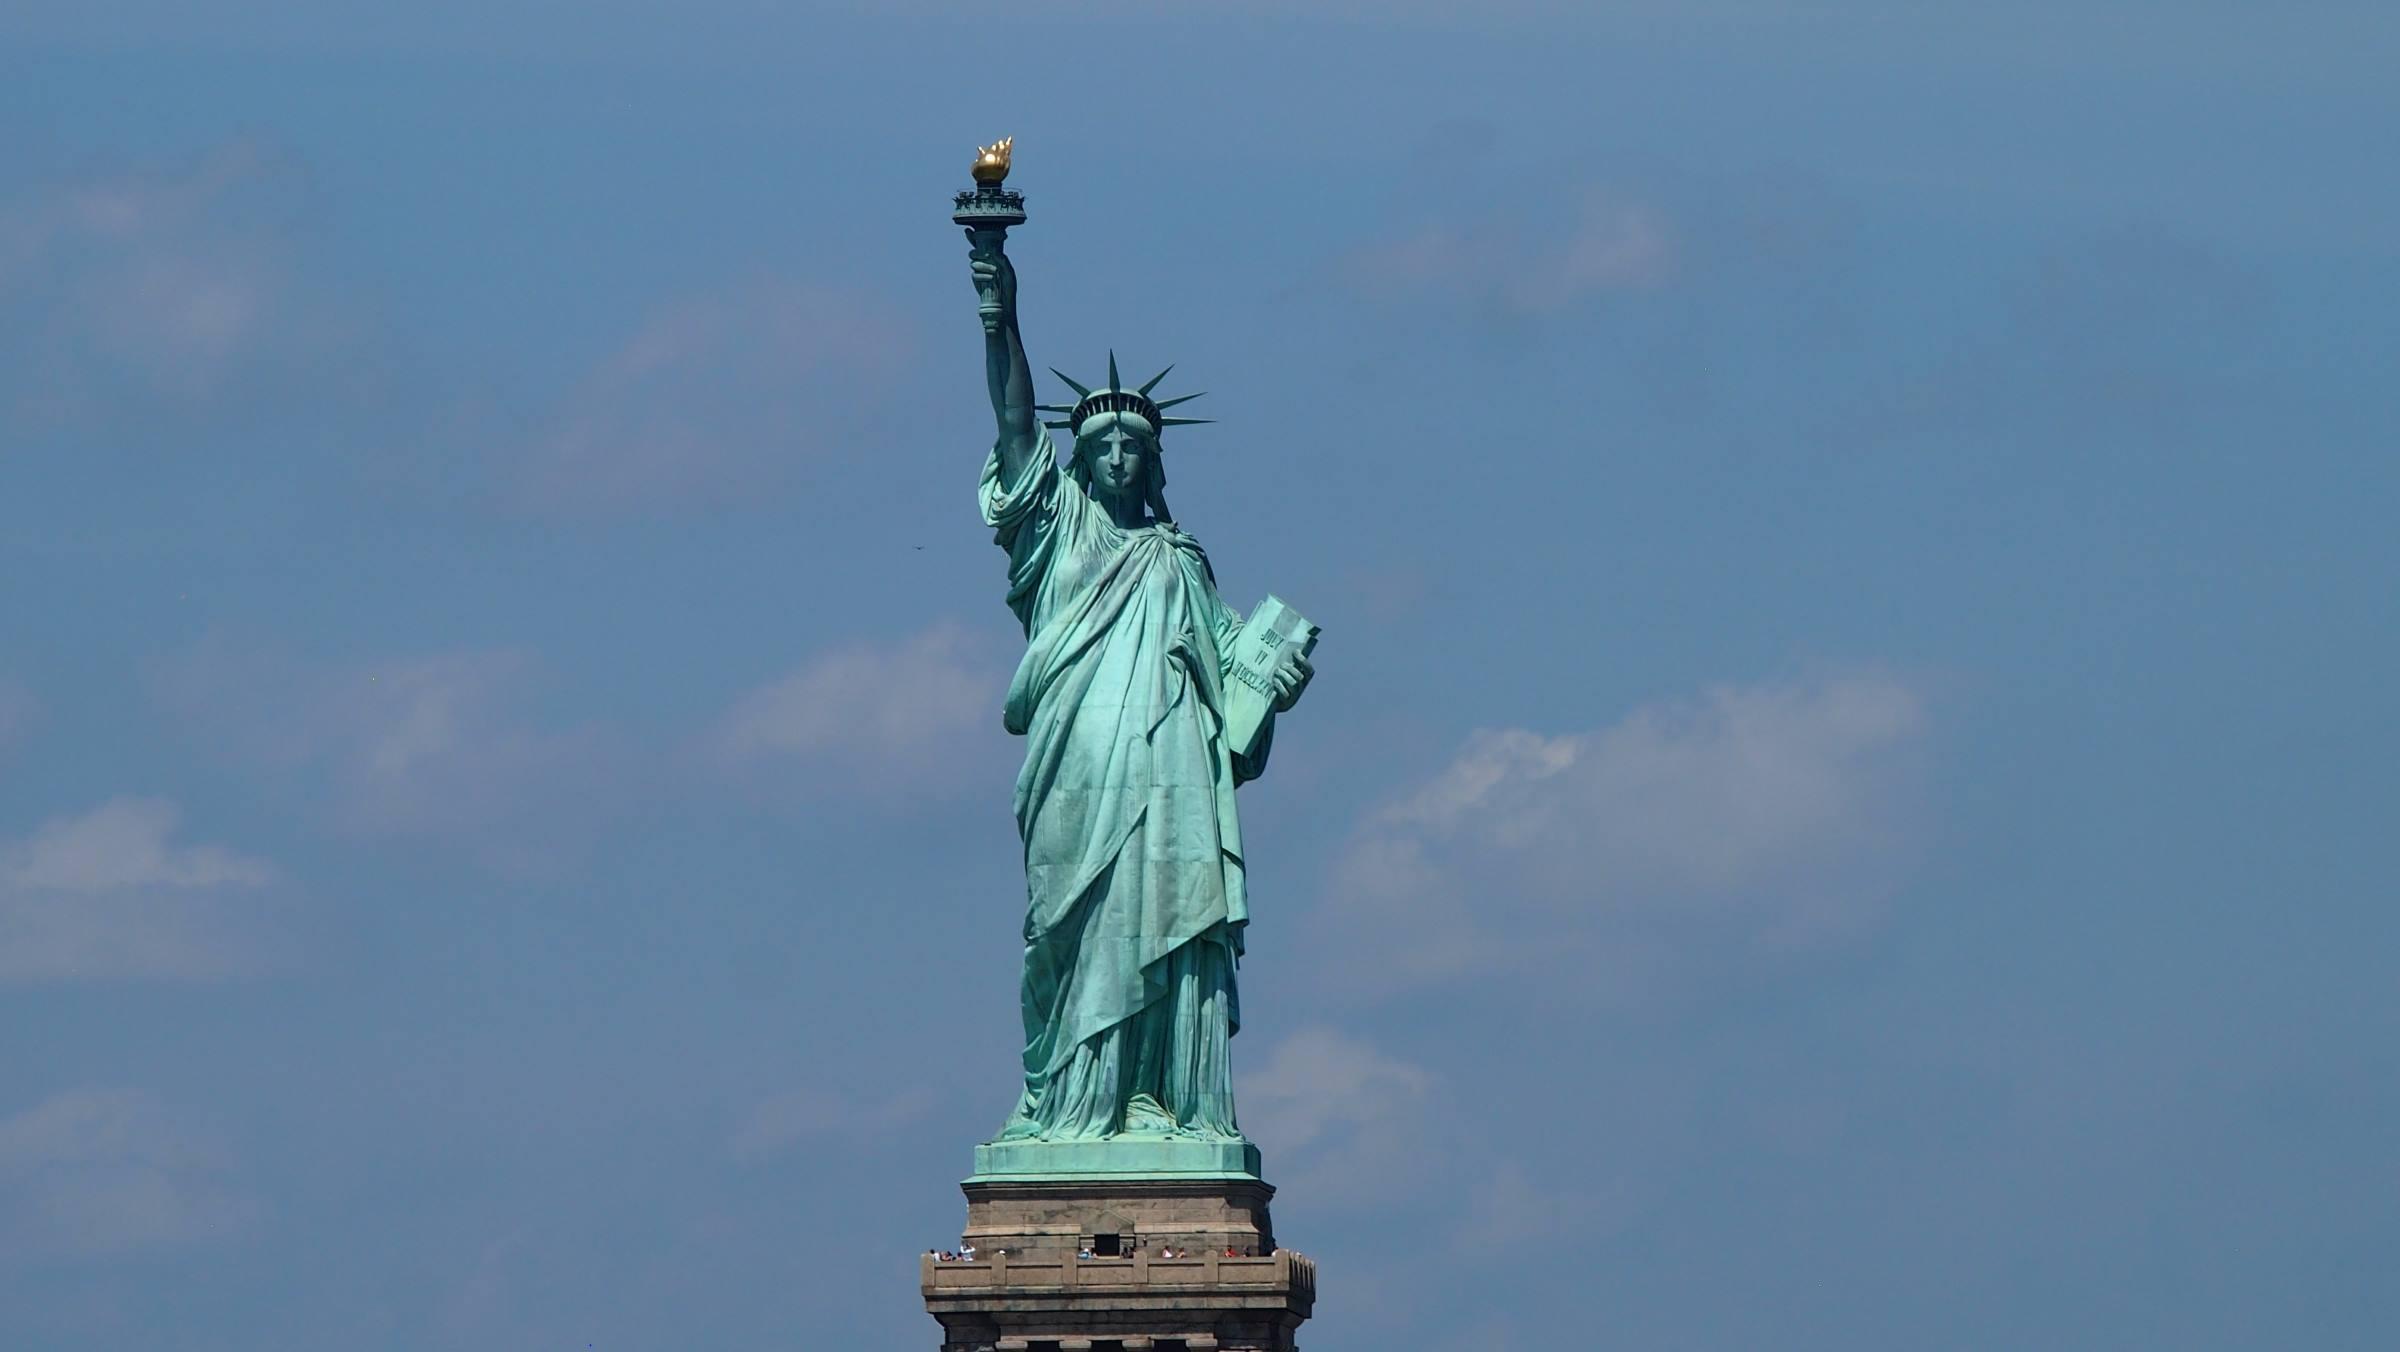 statue of liberty new york blue sky